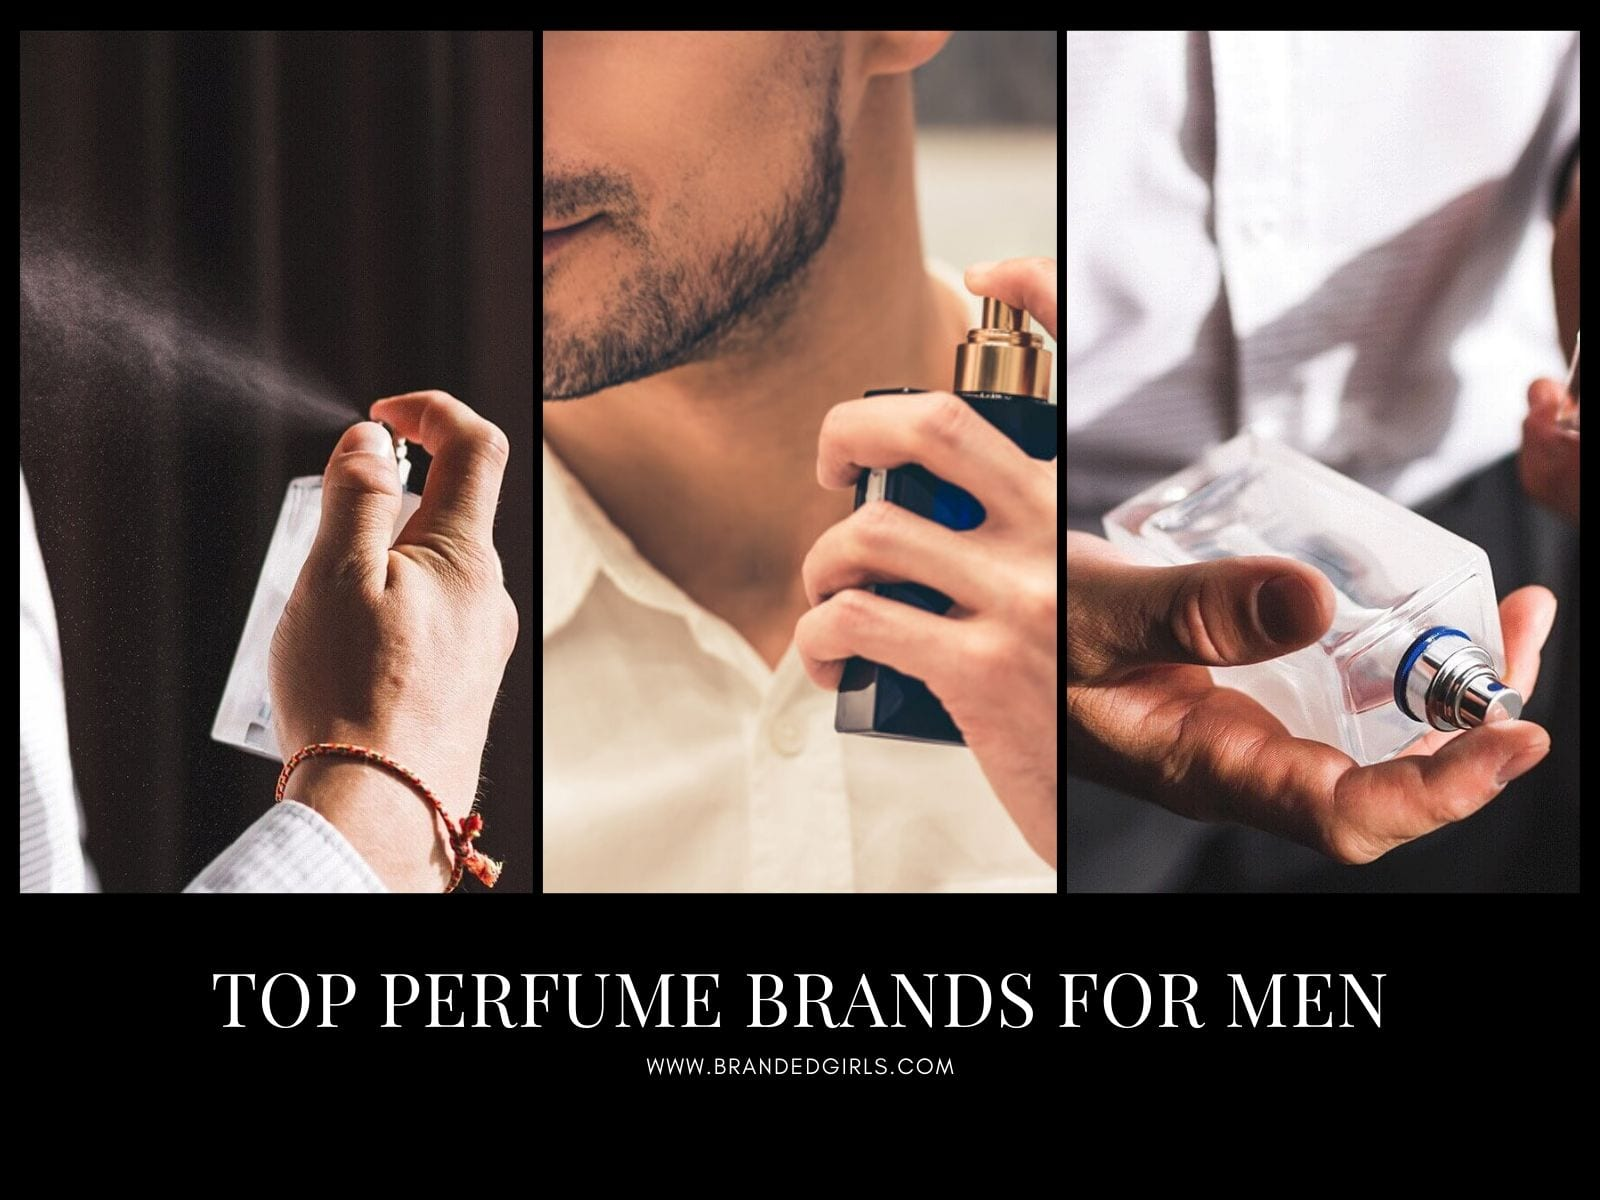 Perfume-Brands-for-Men Top 10 Perfume Brands for Men 2020 - Fresh List